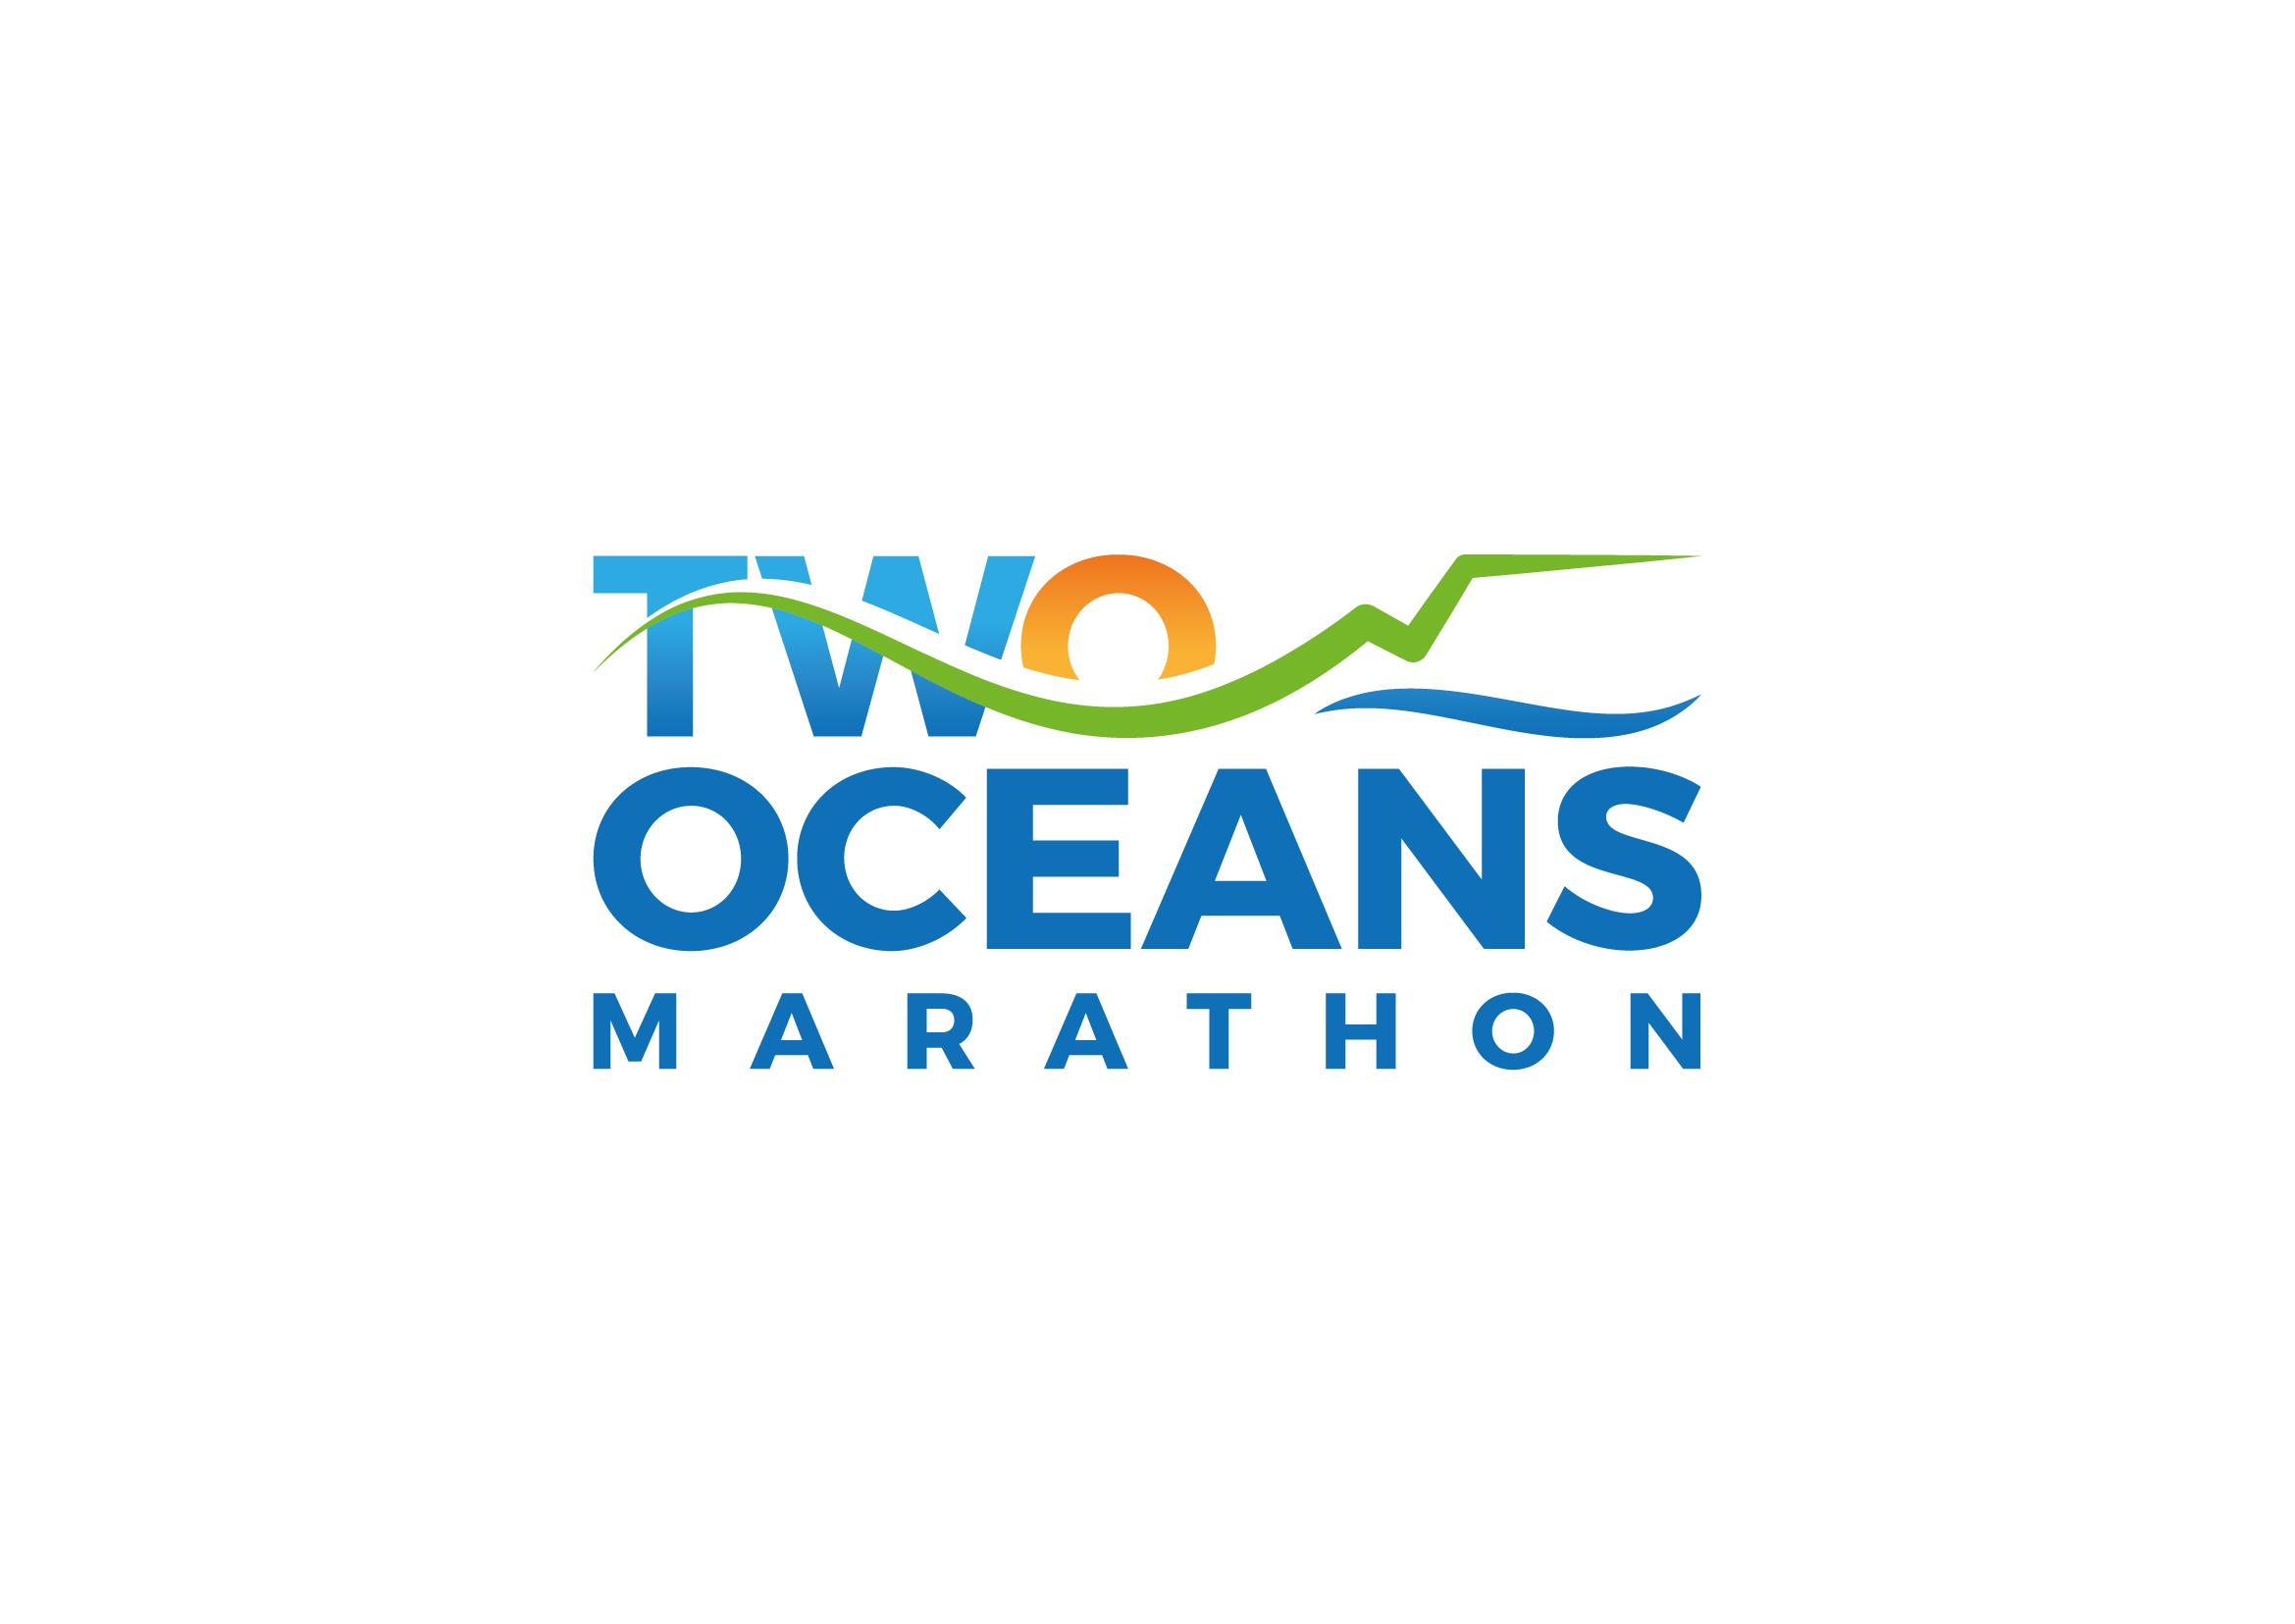 Two Oceans Marathon Announces New Board of Directors